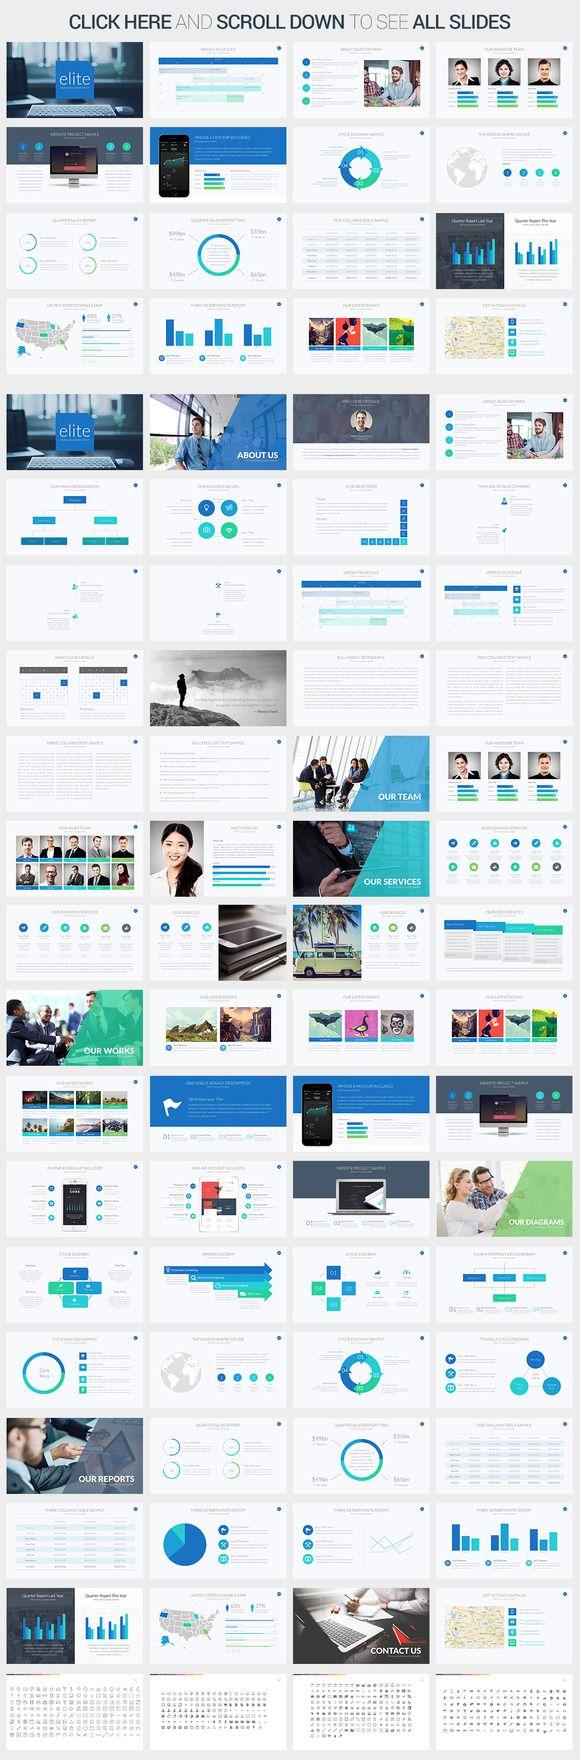 123 best presentation design layout images on pinterest page elite powerpoint template presentations 2 toneelgroepblik Image collections